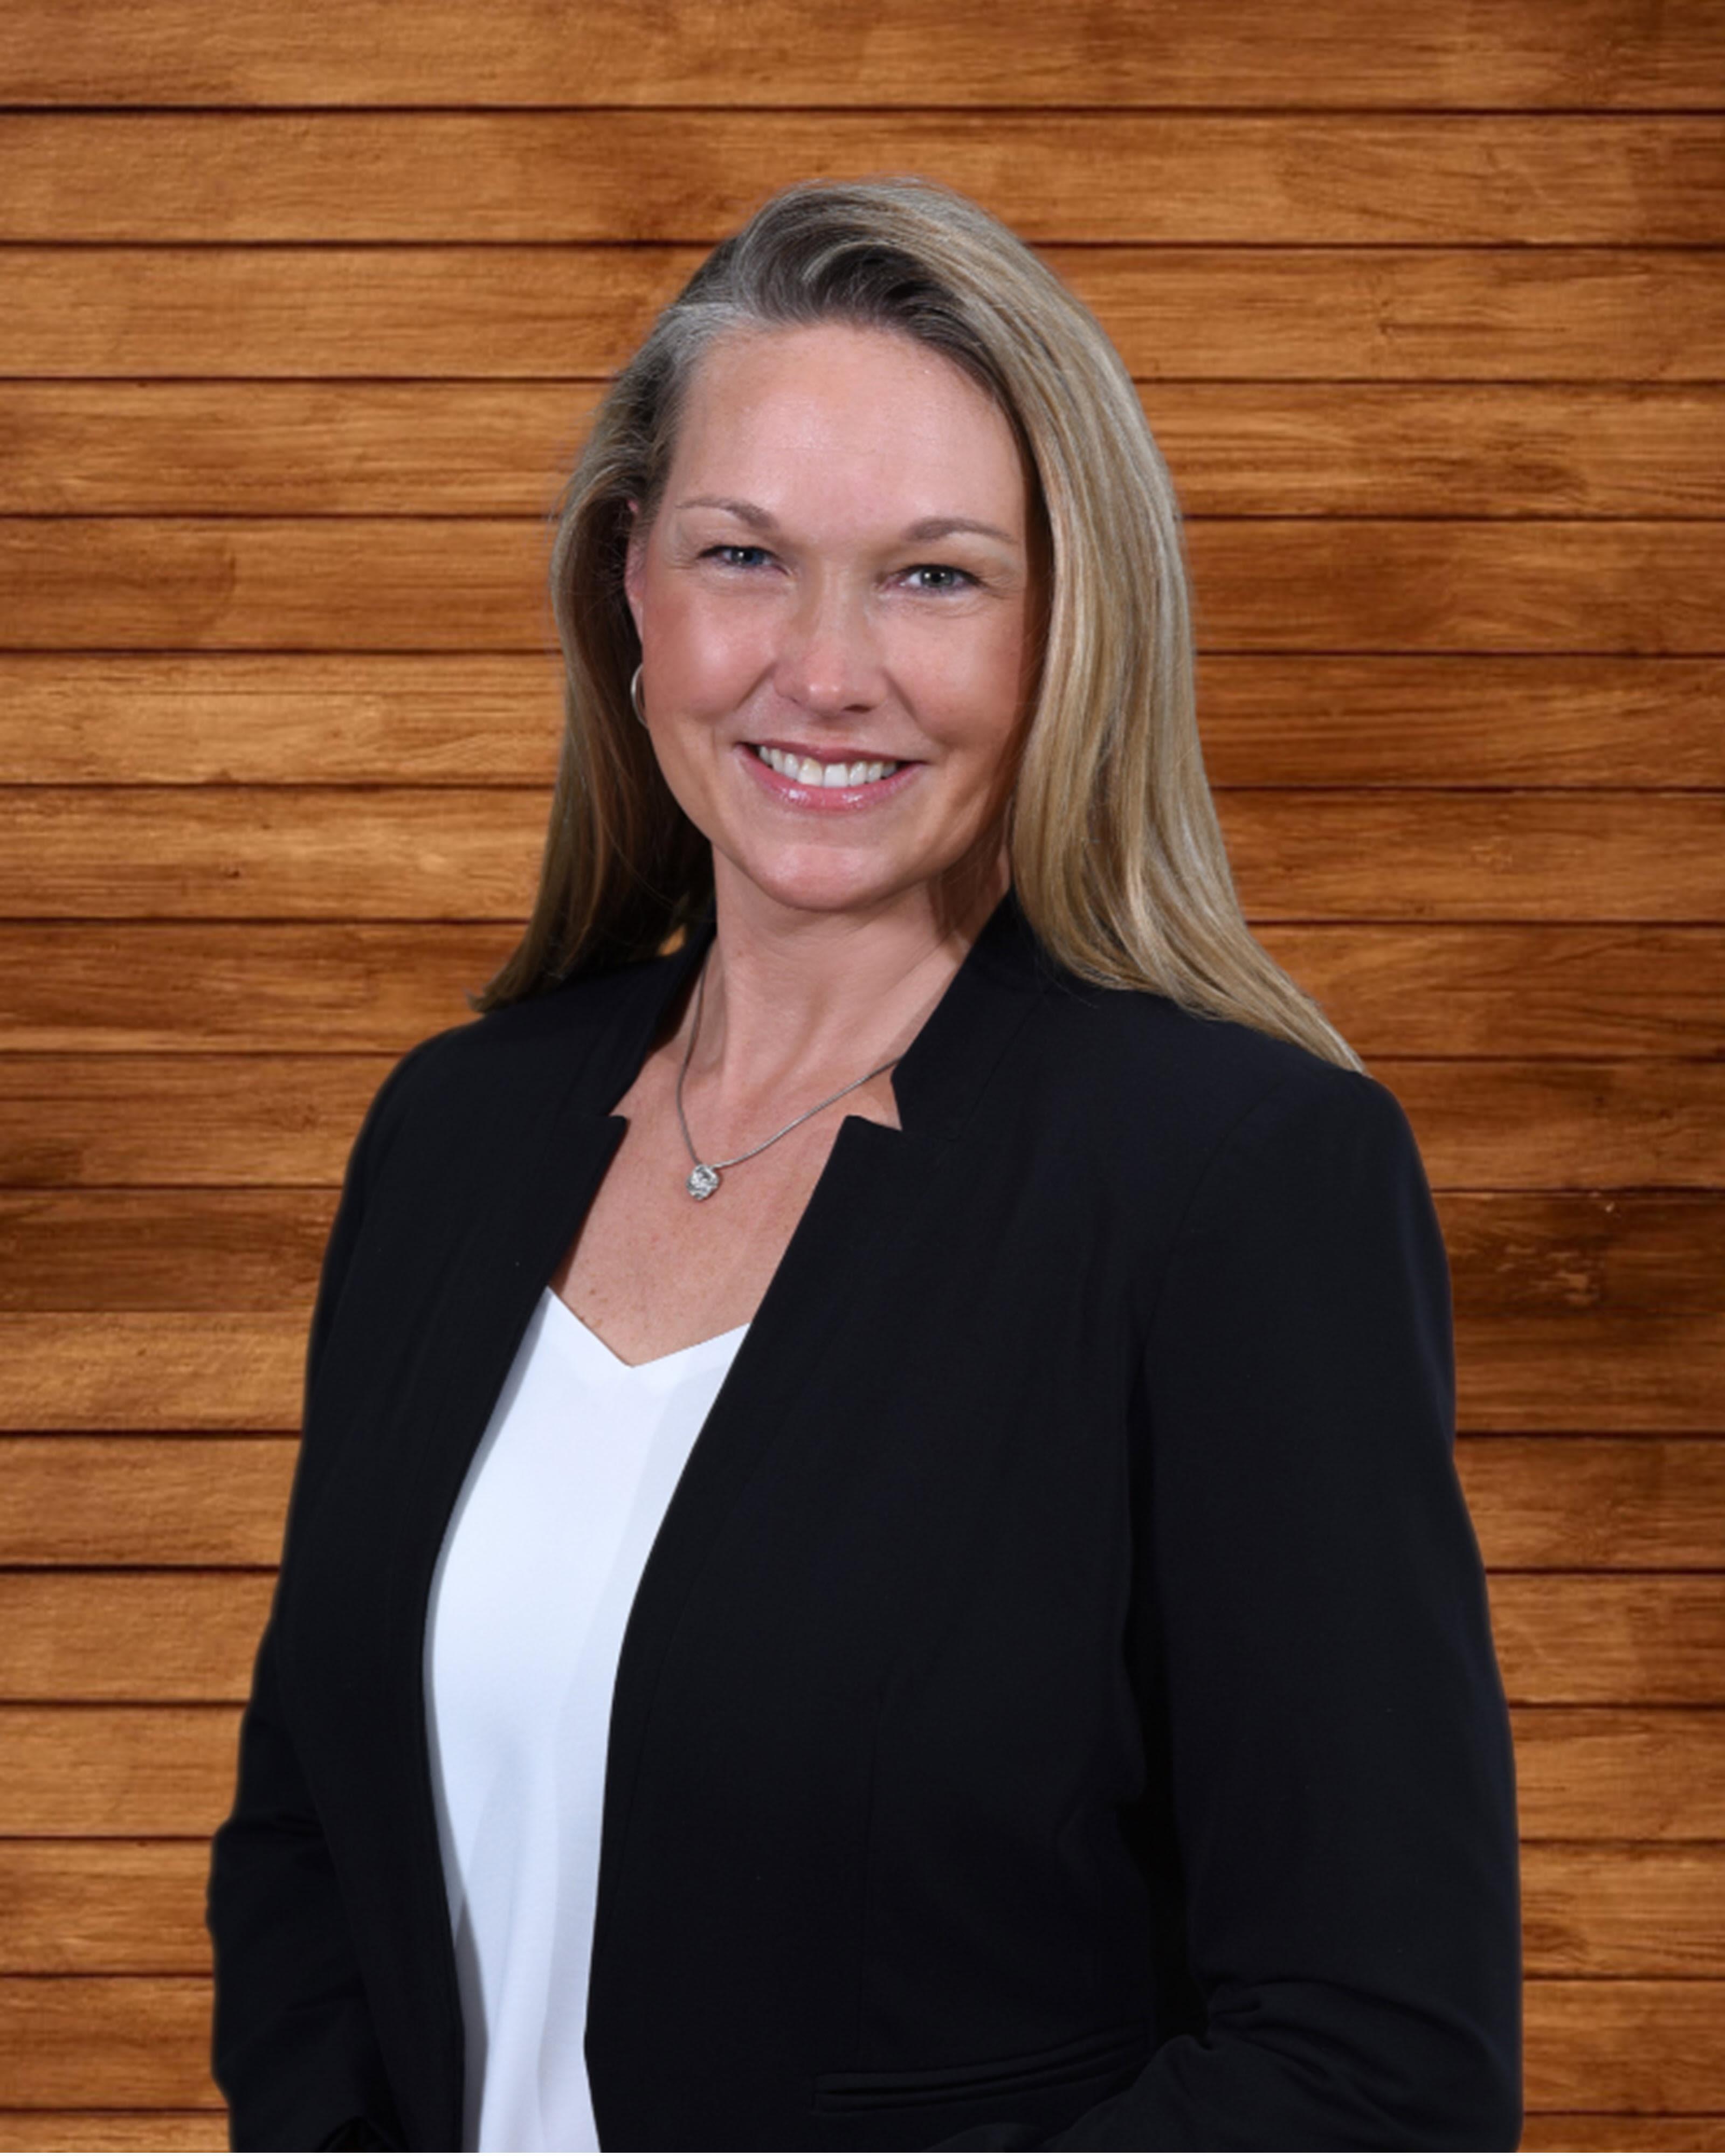 Janet Tiemeyer, Senior Vice President Risk Managment & Quality Assurance at Elegance Living, LLC